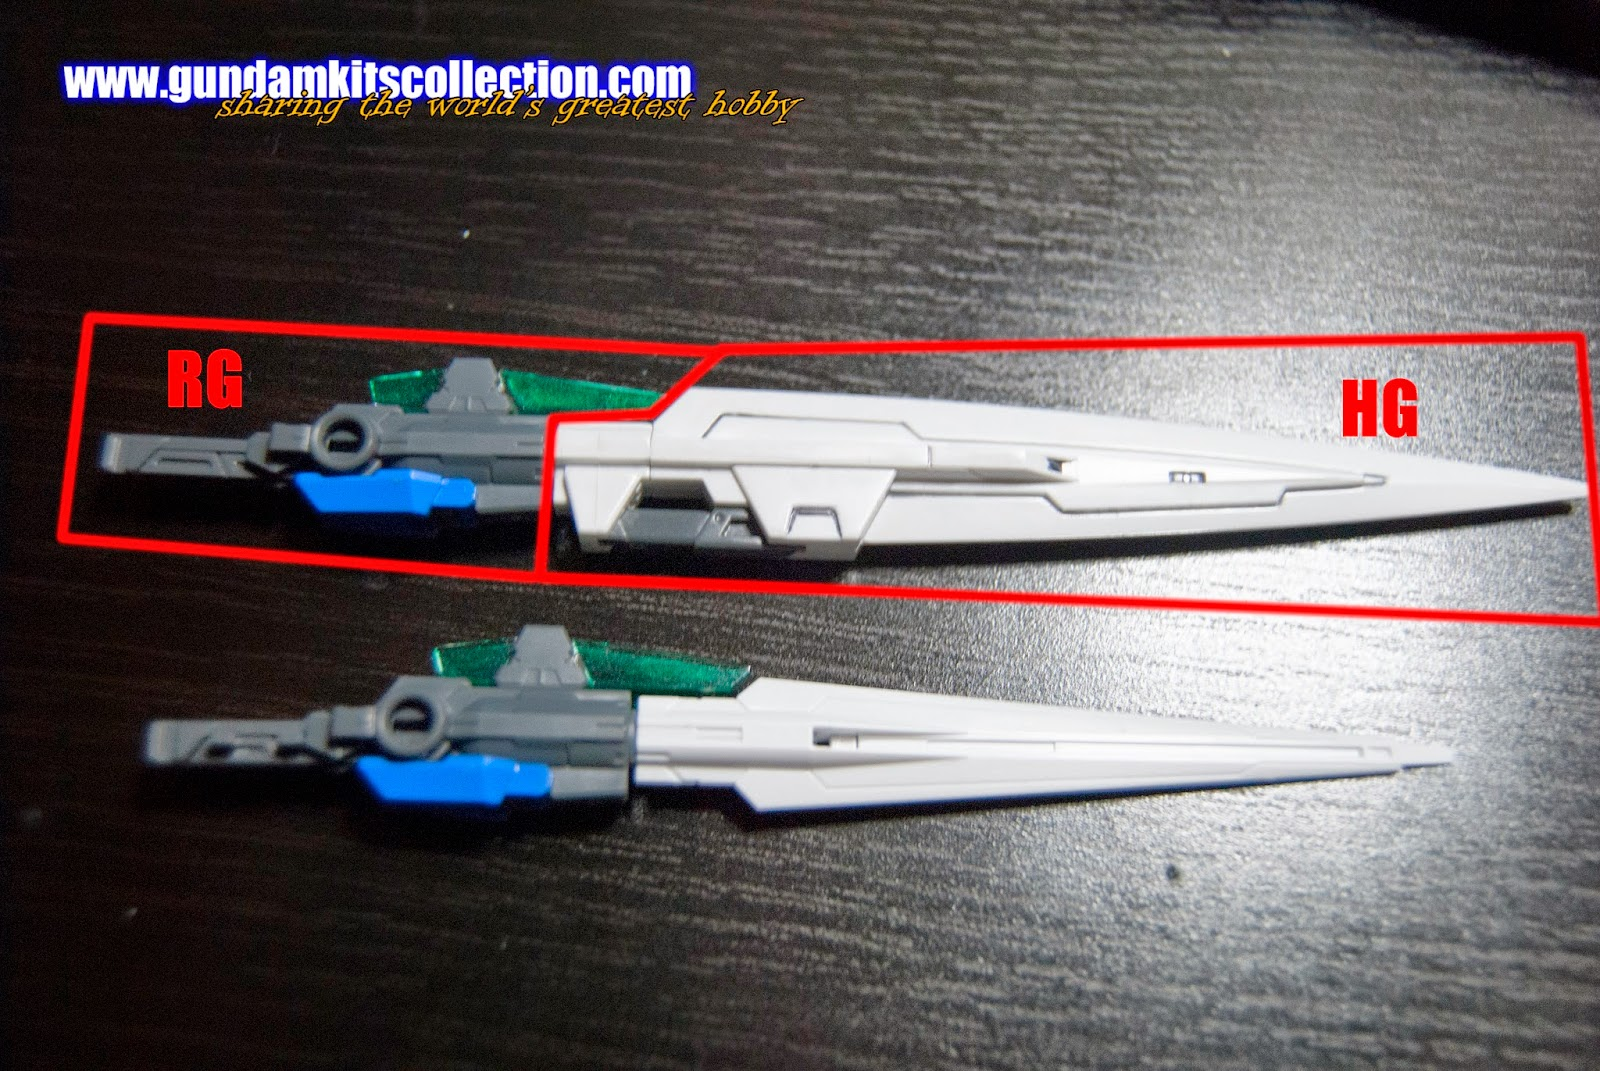 Gundam Recipe Rg 1 144 00 Gundam Seven Sword G Gundam Kits Collection News And Reviews